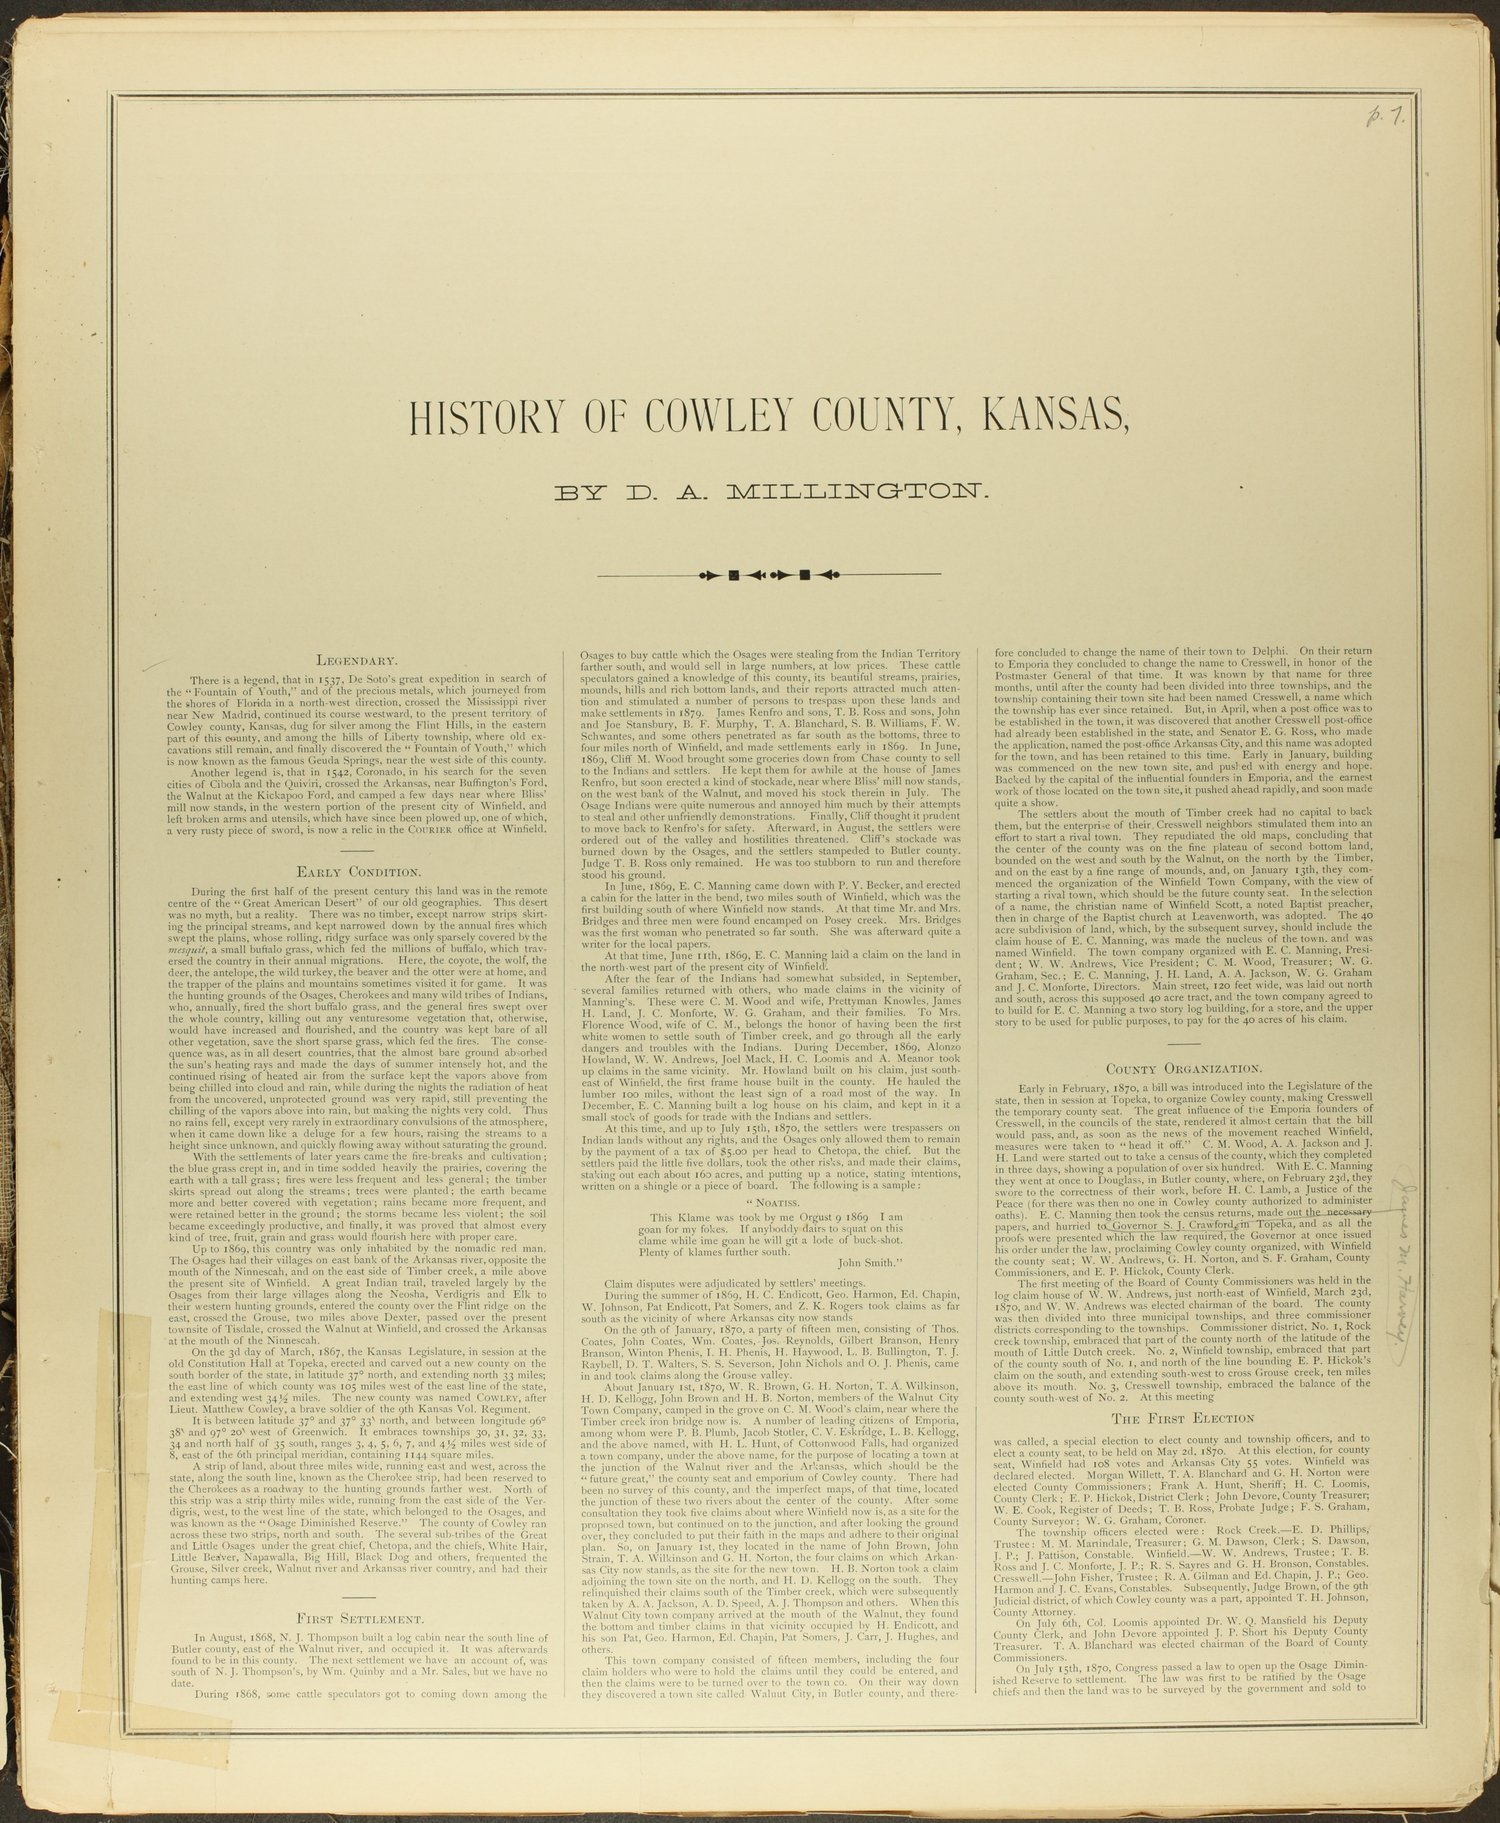 Historical atlas of Cowley County, Kansas - 7